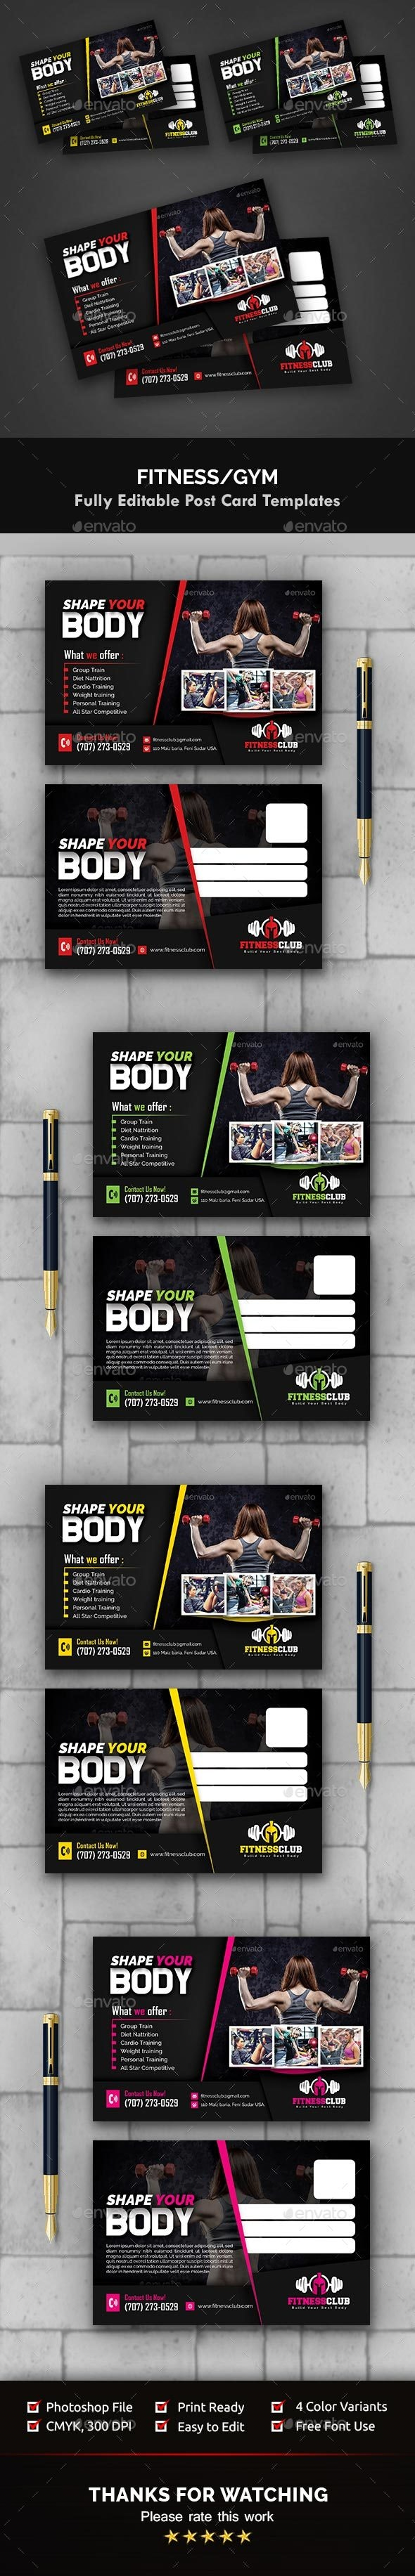 Fitness / Gym Postcard Templates - Cards & Invites Print Templates